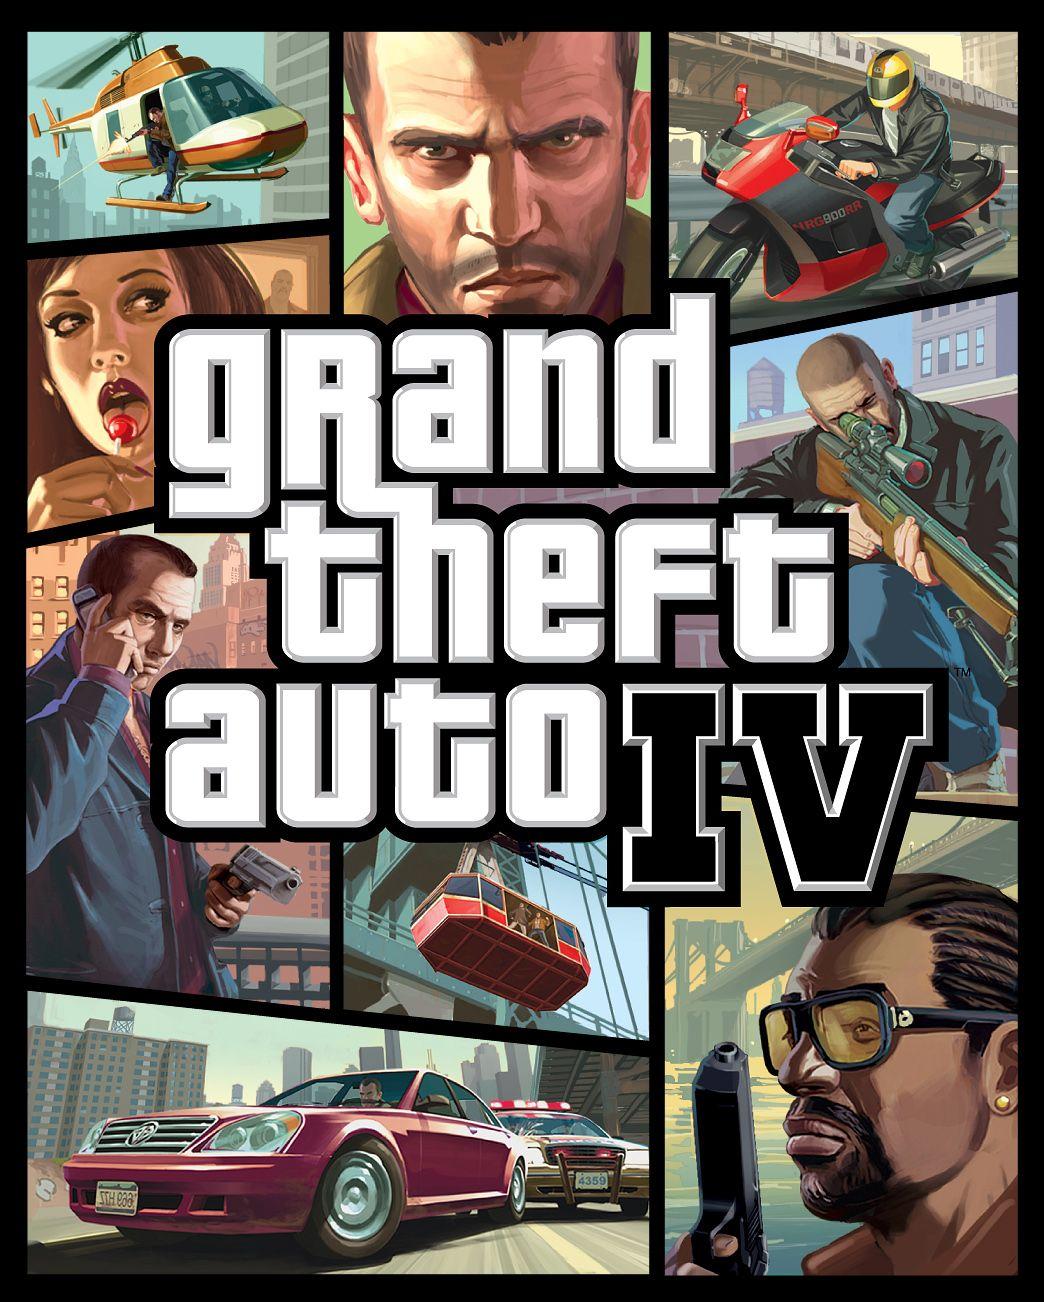 GTA4 (+ Episodes from Liberty City) - Rockstar